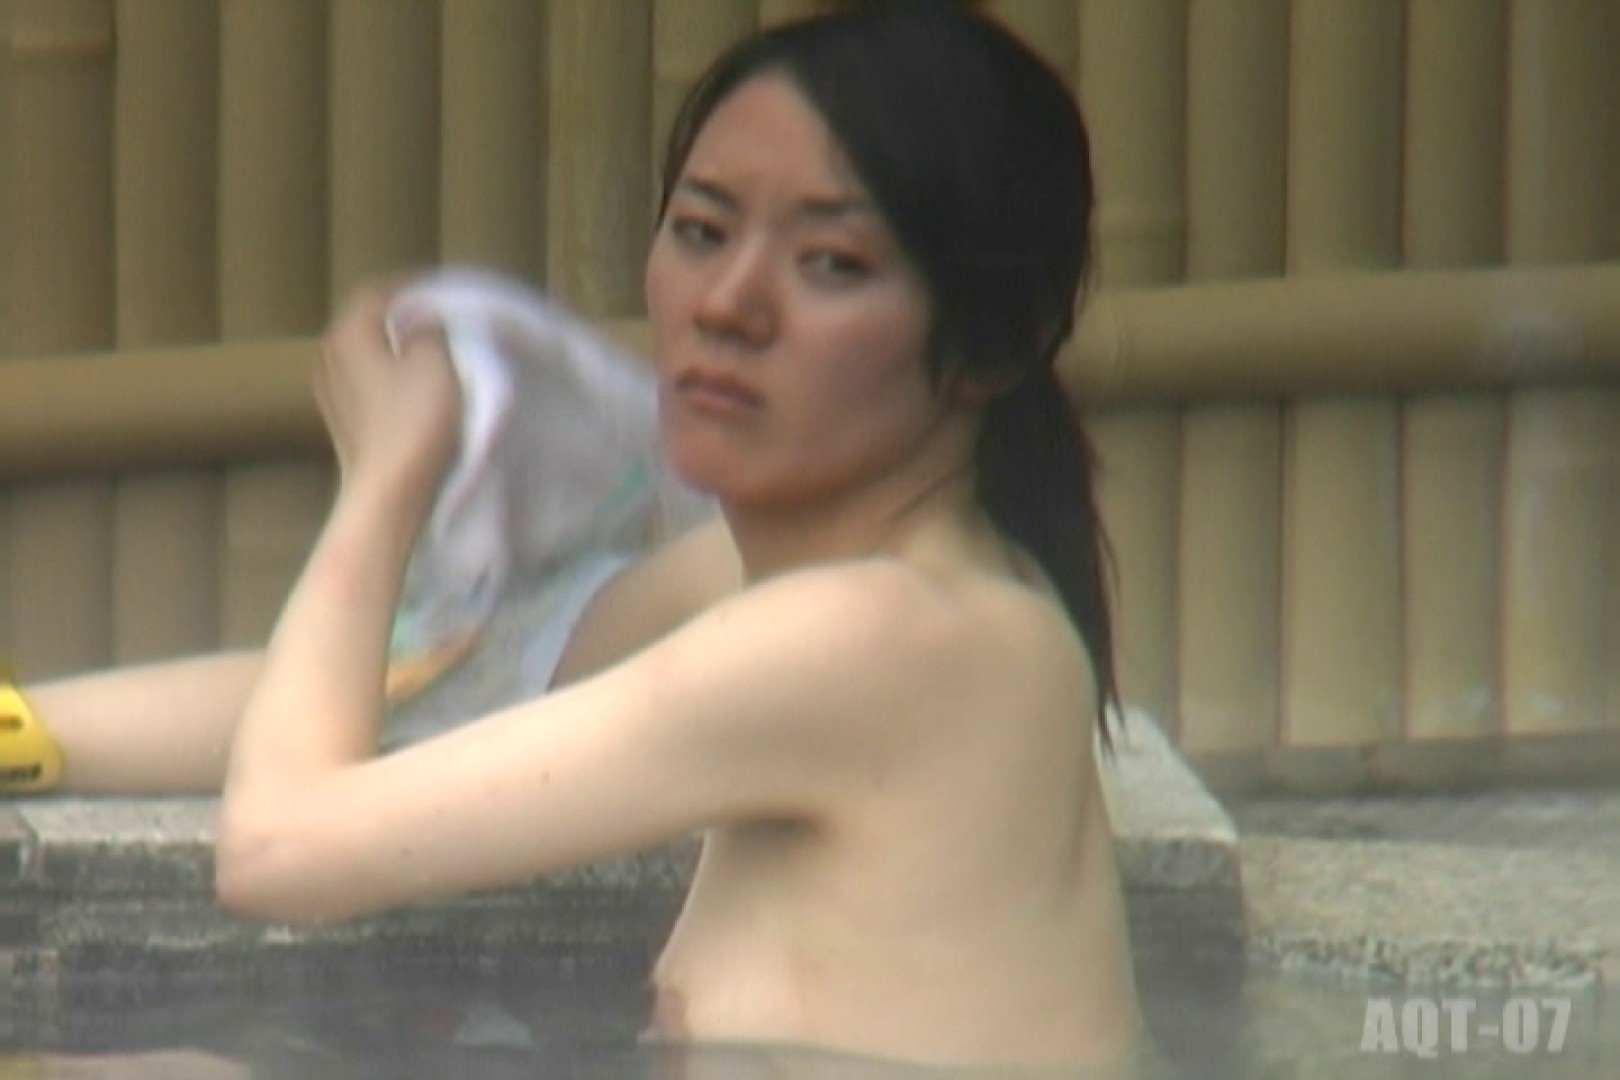 Aquaな露天風呂Vol.765 OLセックス 覗きおまんこ画像 77画像 62